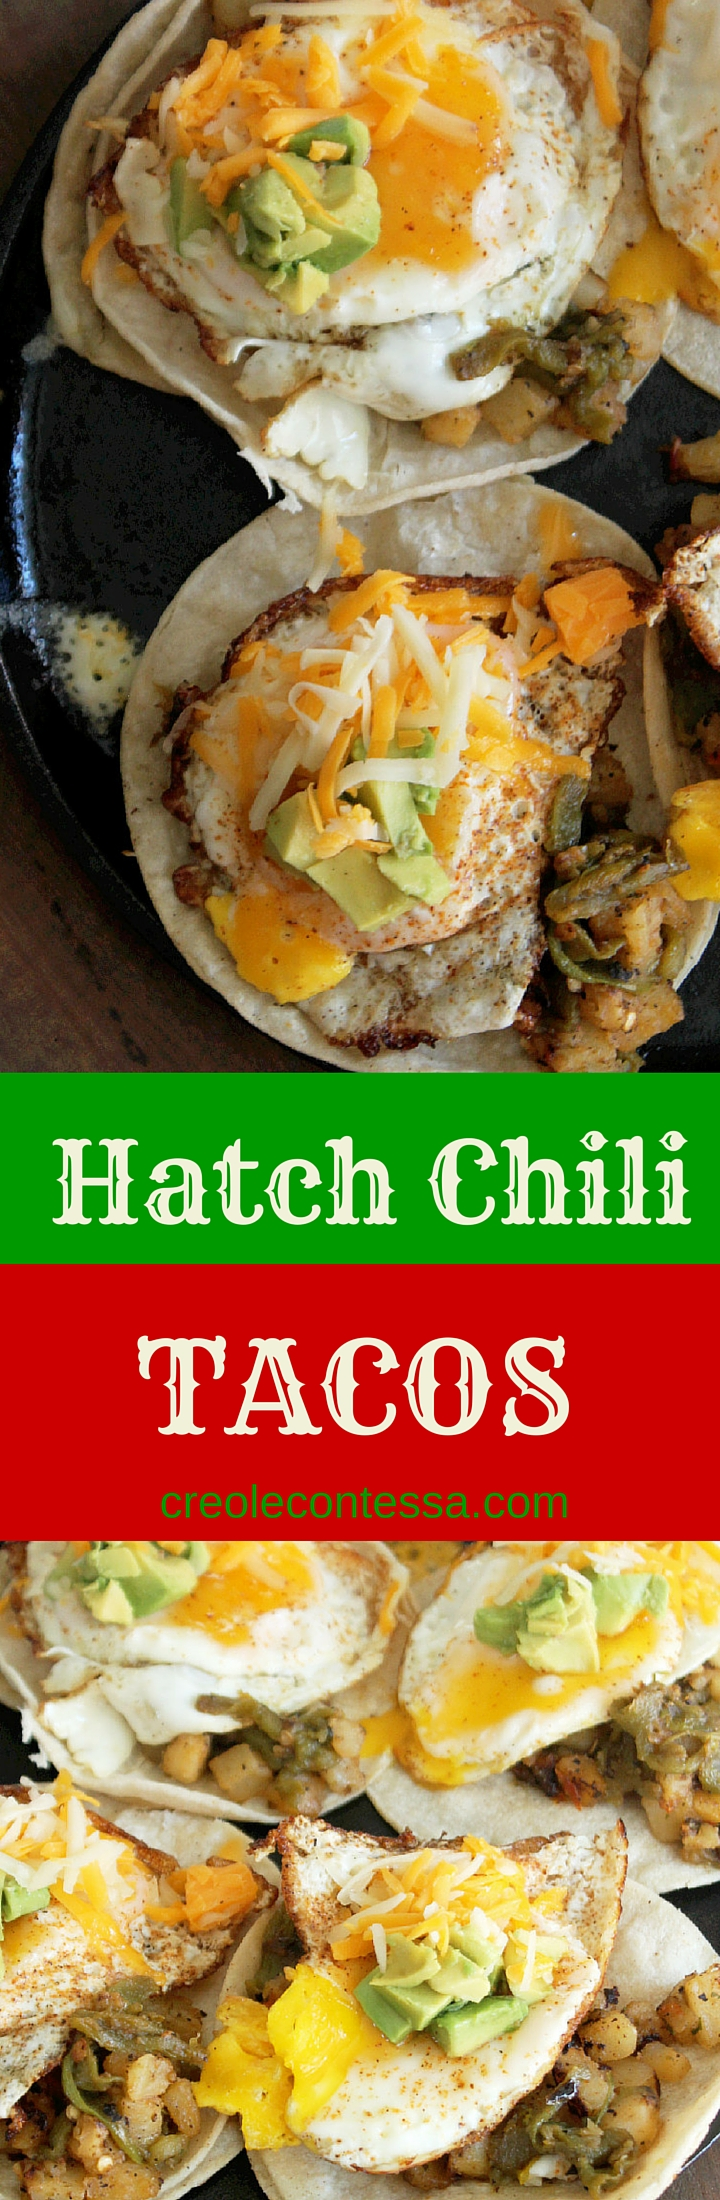 Hatch Chili Breakfast Tacos  -Creole Contessa